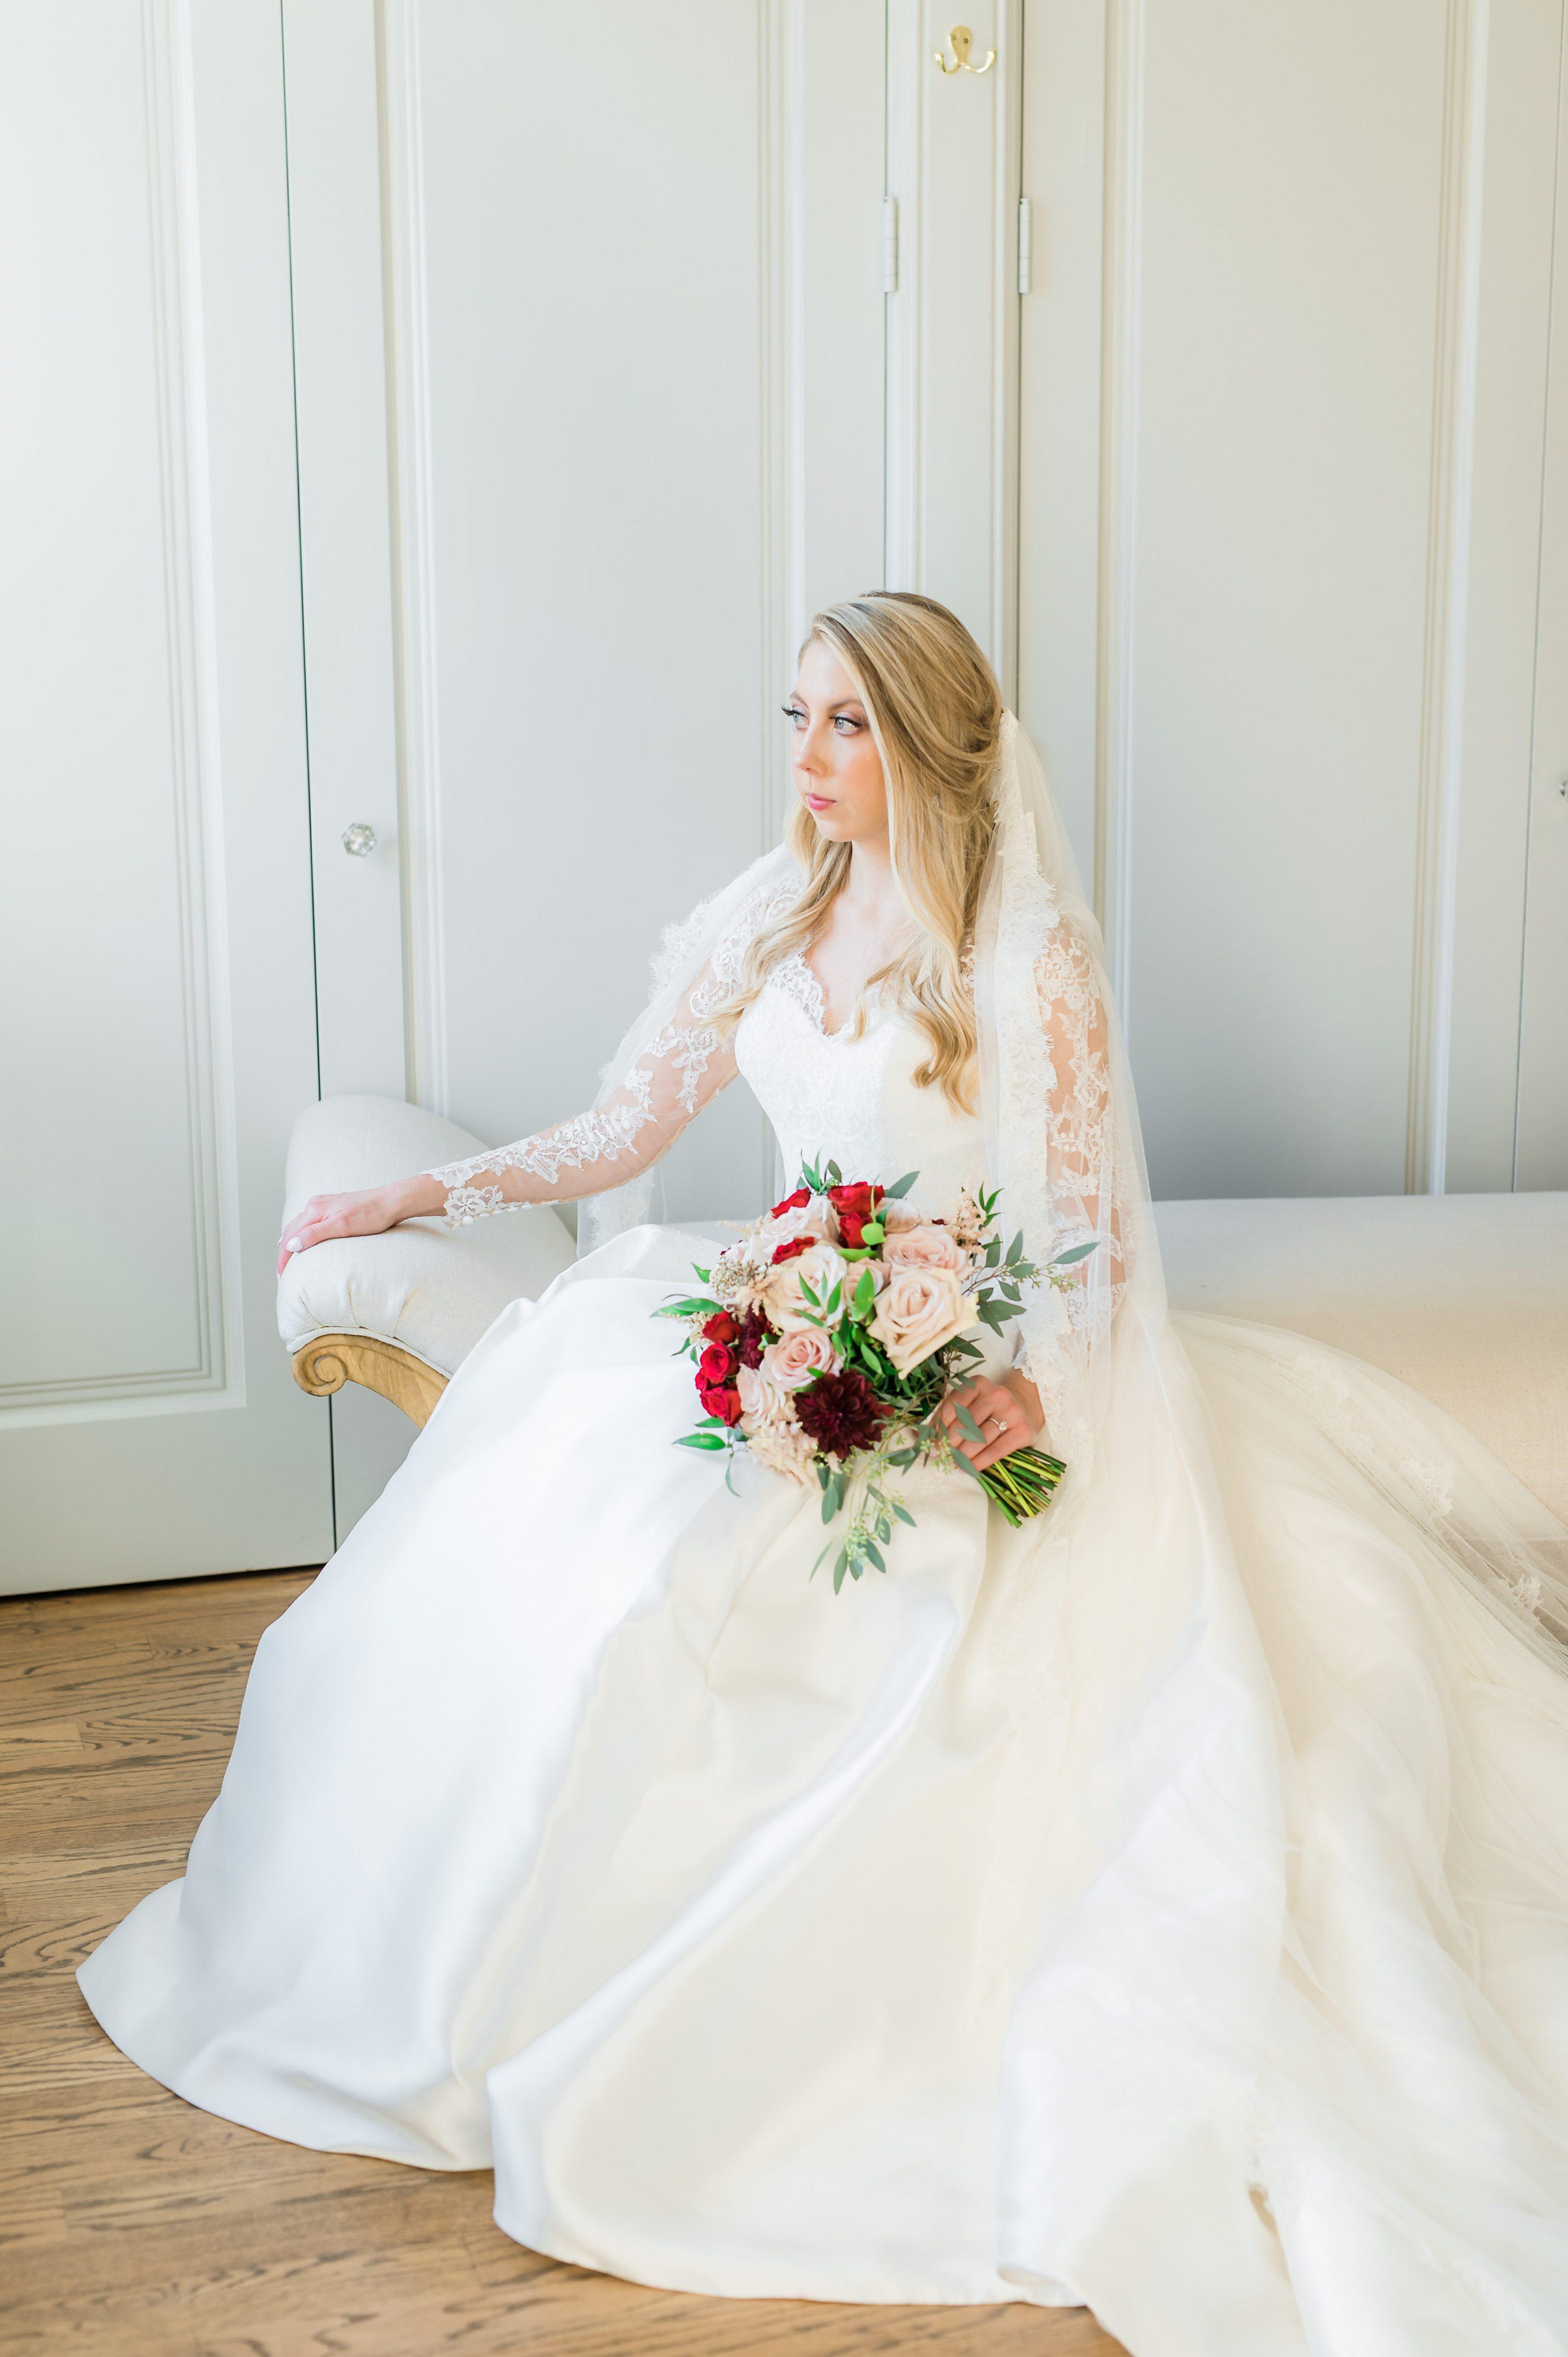 Eric & Jenn Photography,Houston Bridal